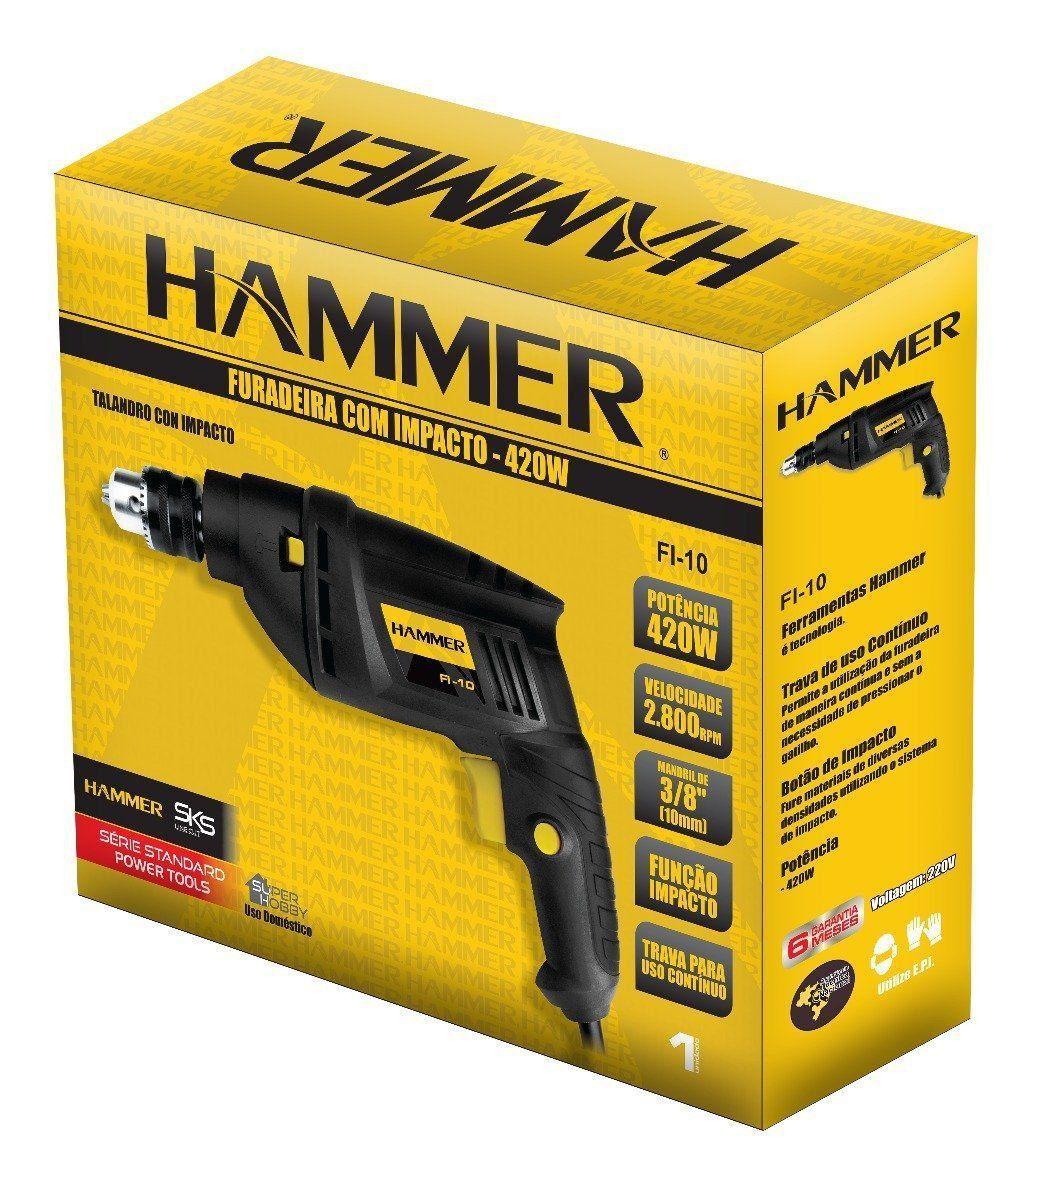 Furadeira Impacto 420w Mandril 3/8 Pol  10MM Fi-10 Hammer  - EMPORIO K